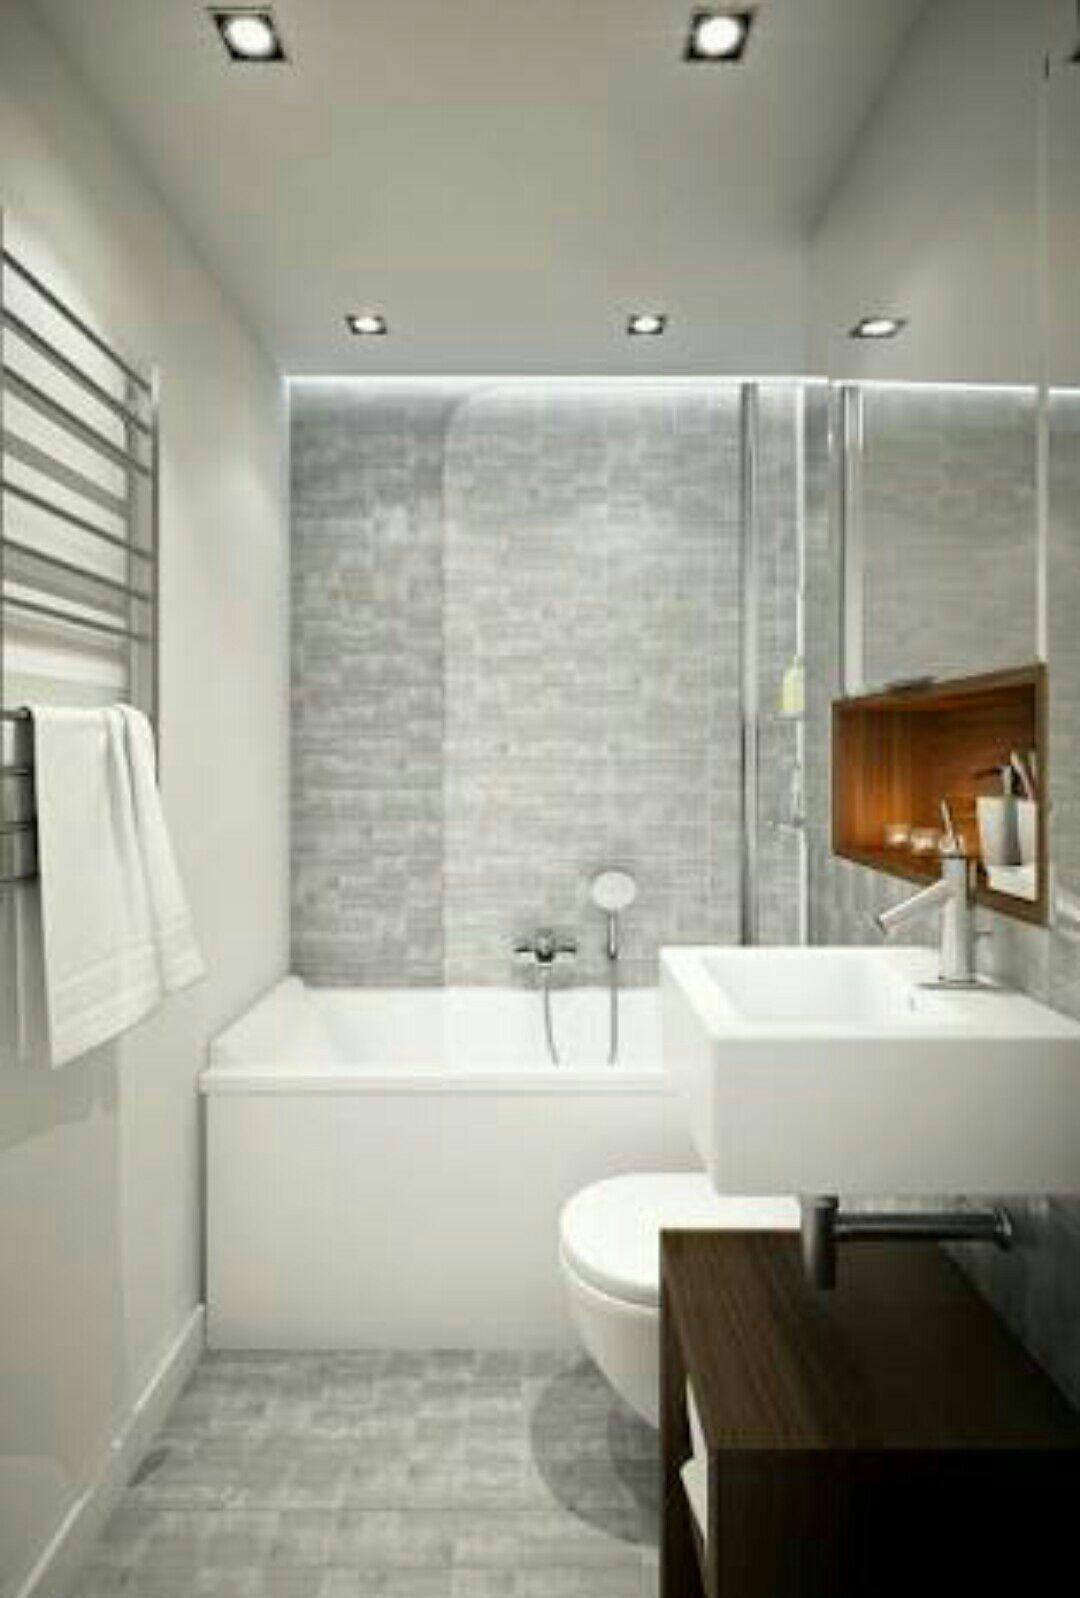 Banheiro da casa